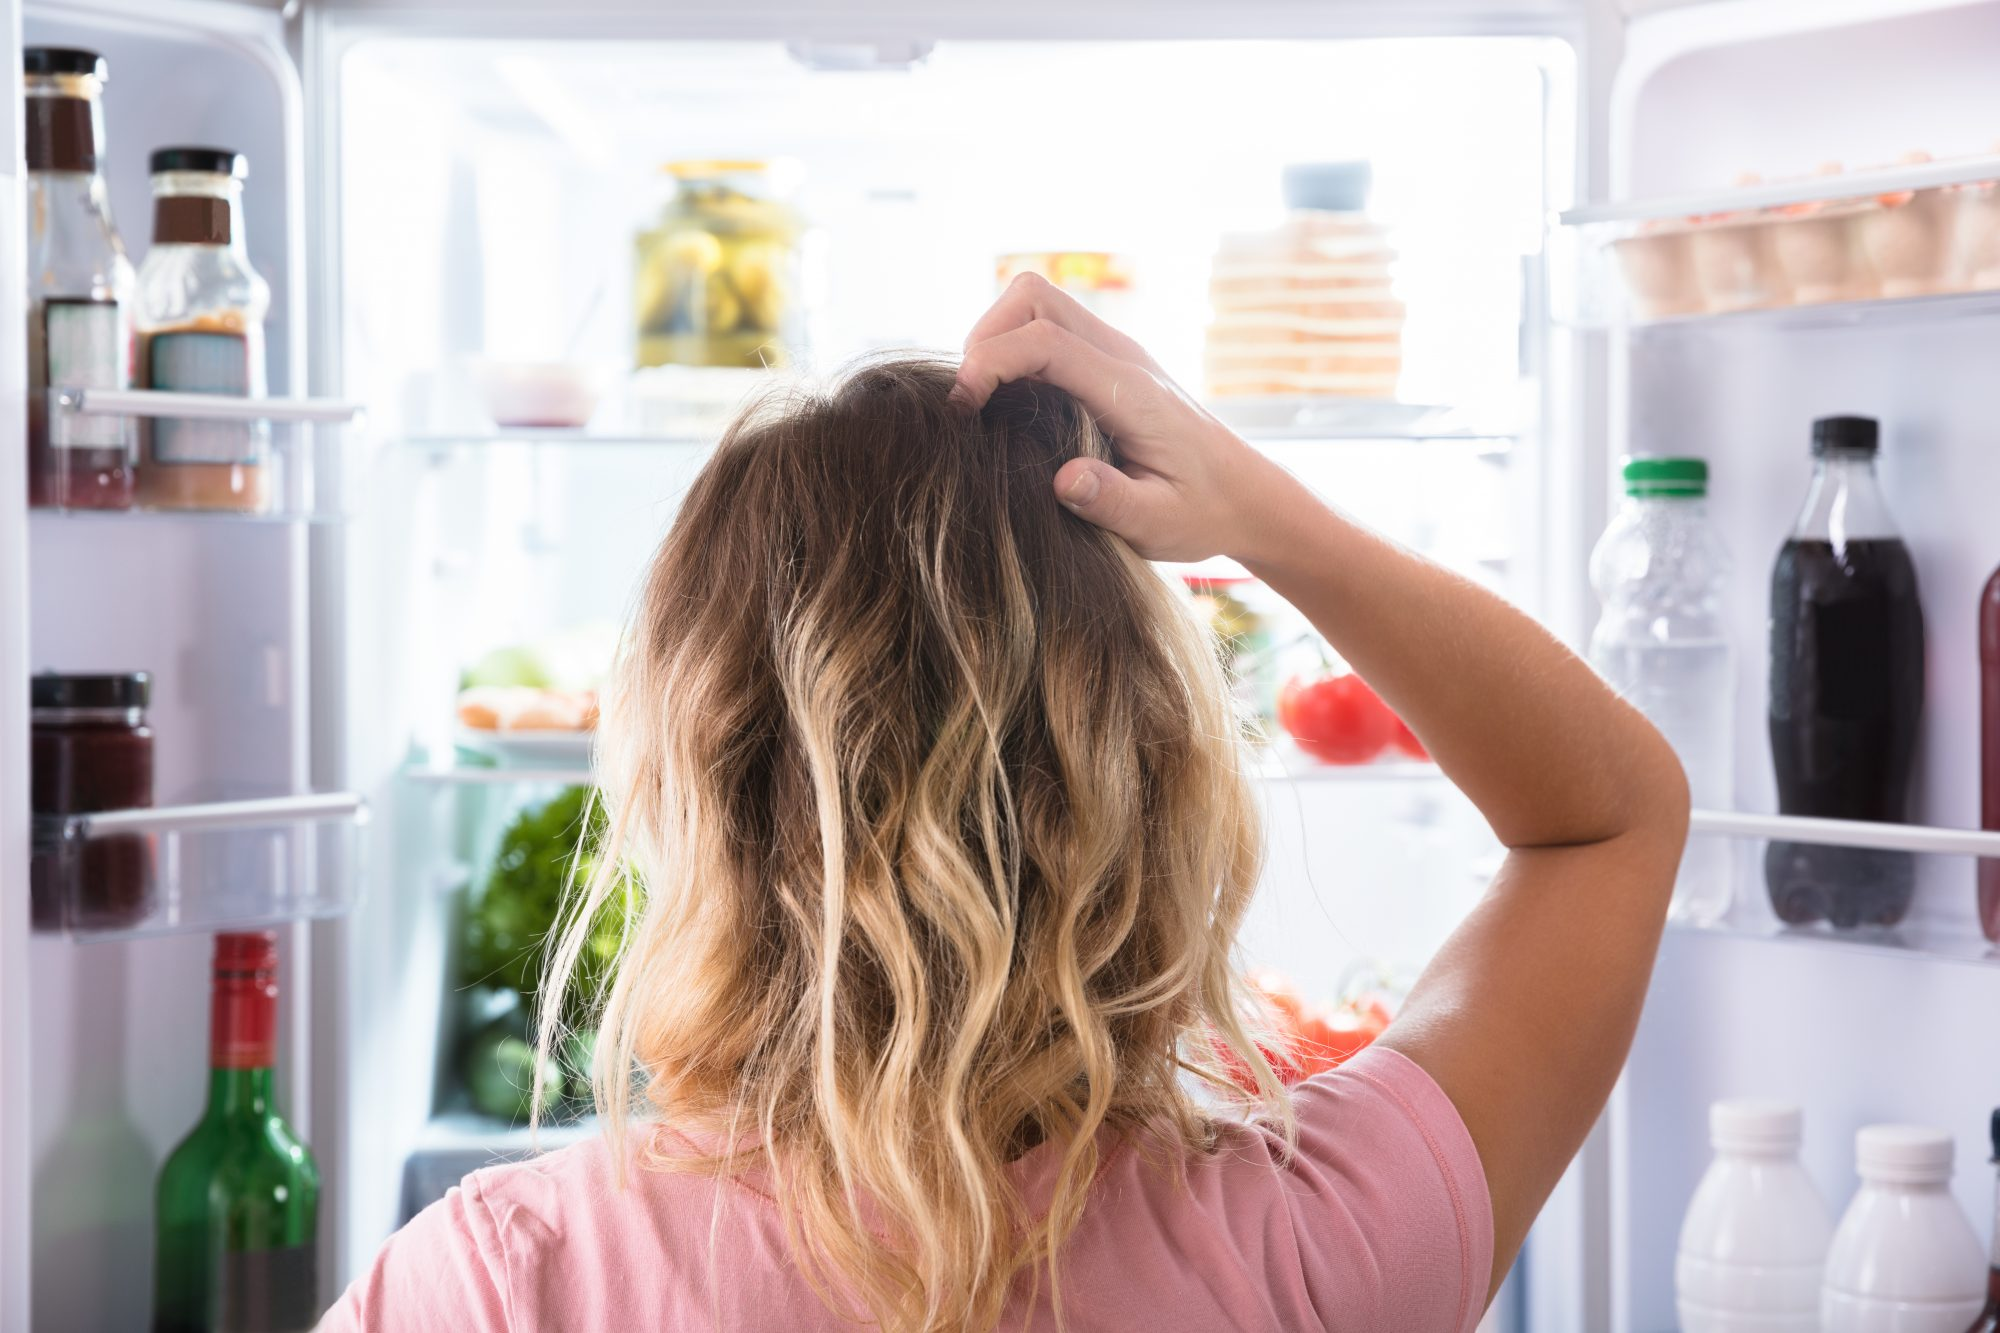 Getty Open Freezer Image